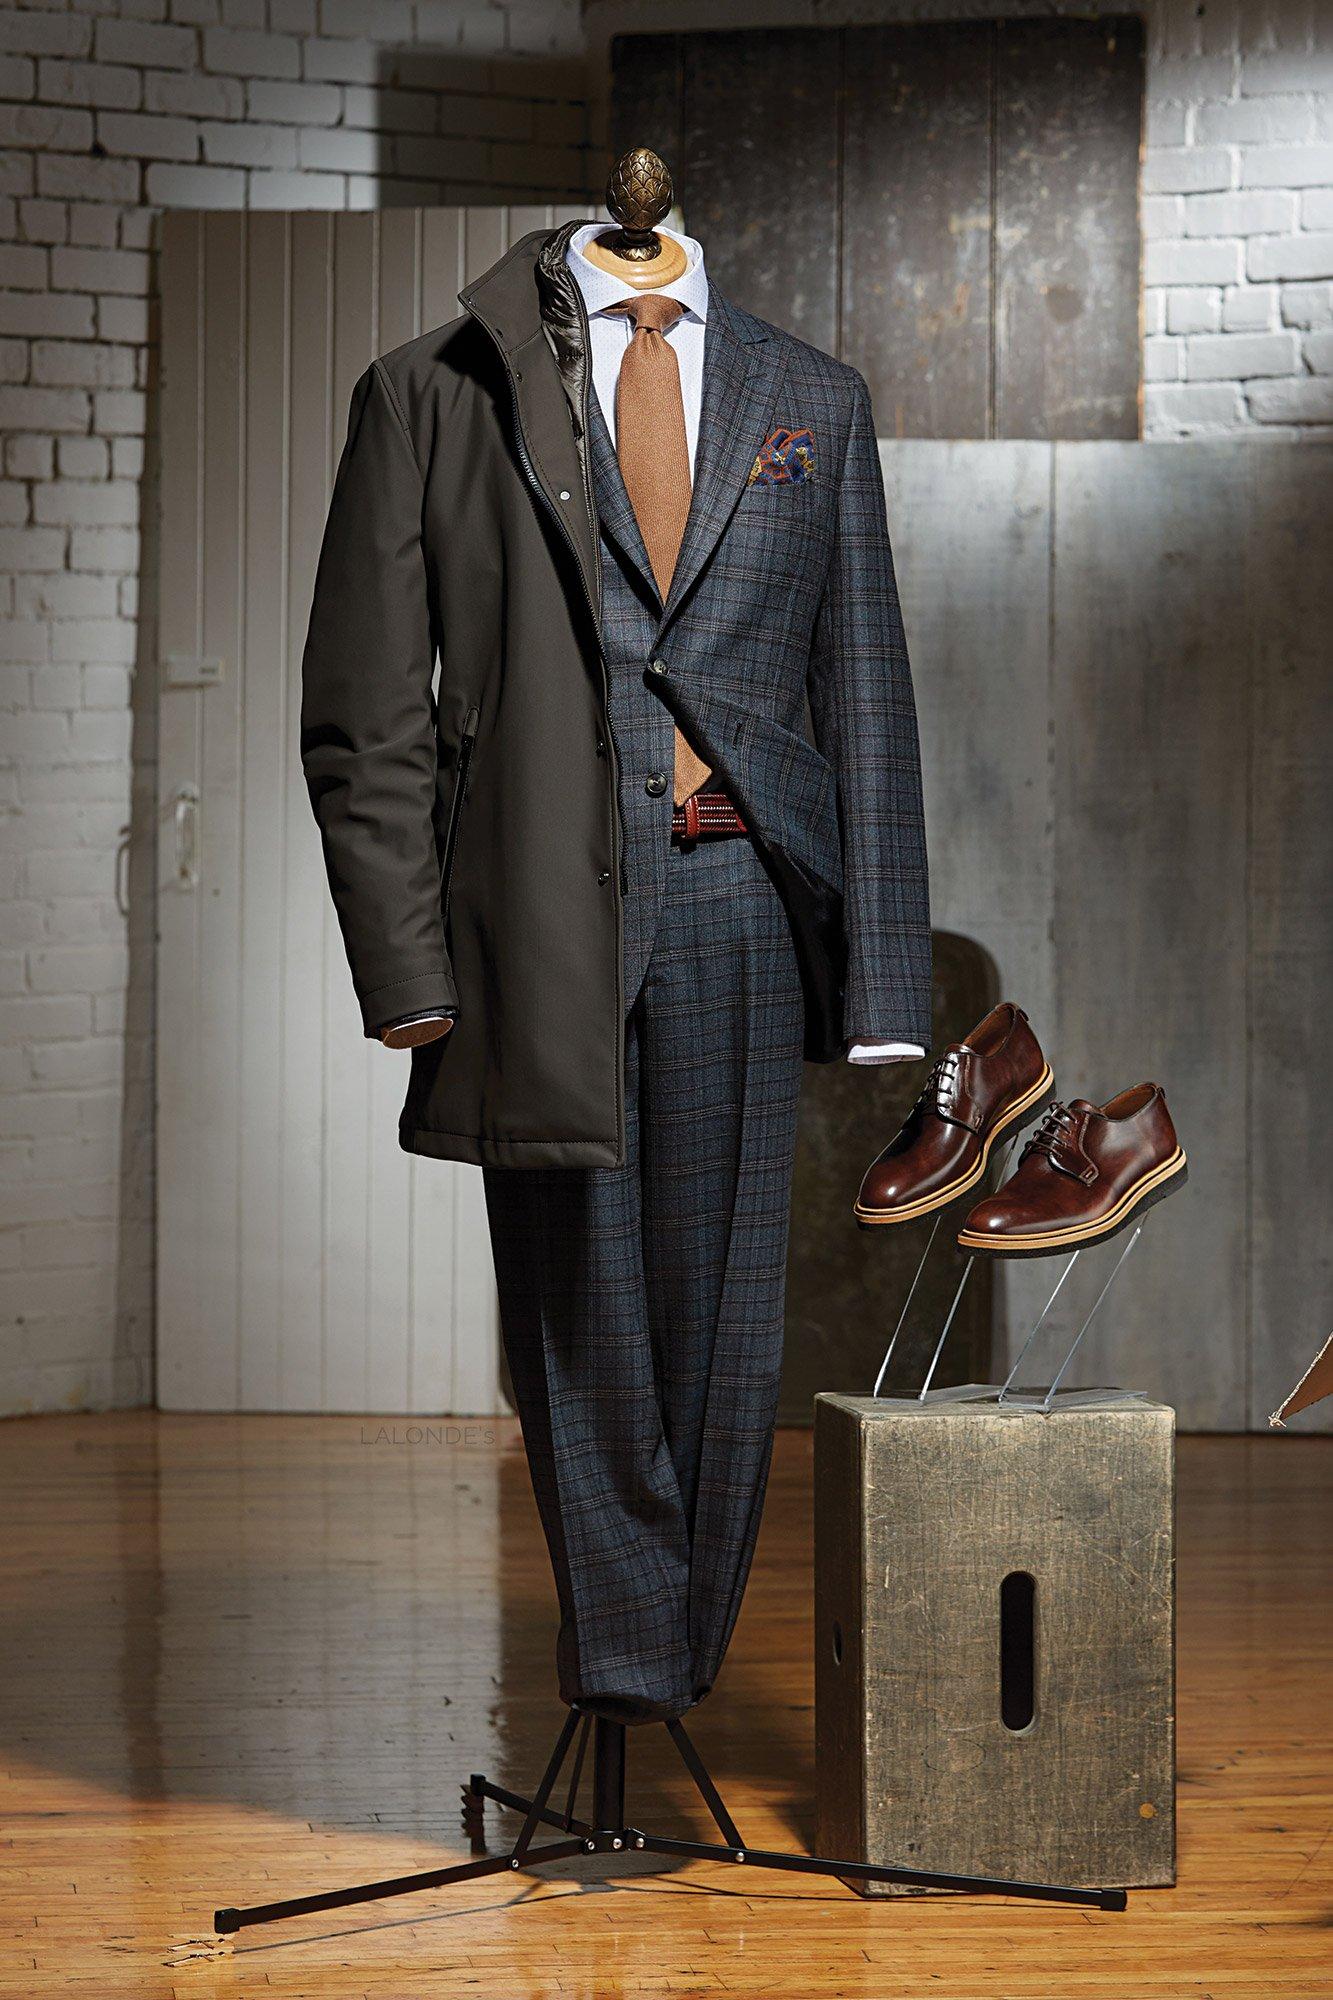 FW17 DRESSY - Boglioli & Montecore Outfit - LALONDE's